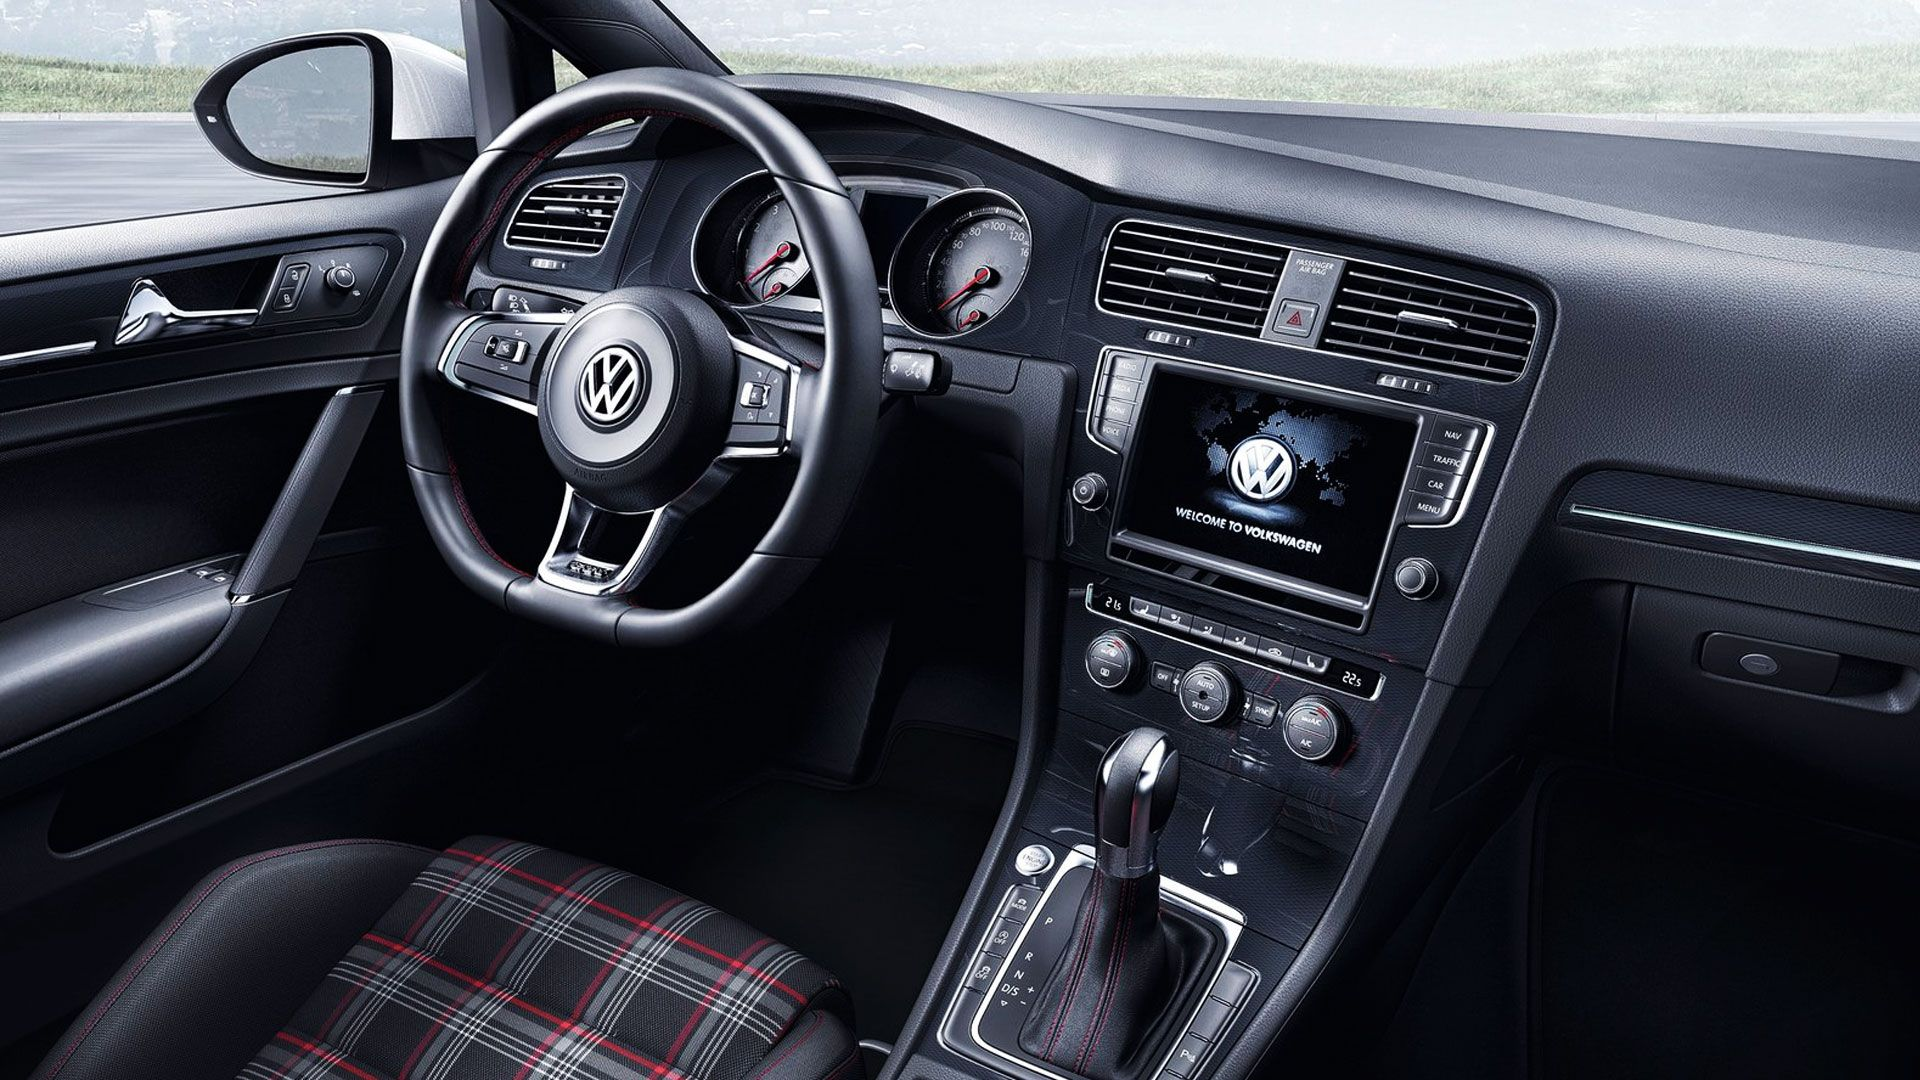 2014 Volkswagen Golf Gti Sporty Auto Black Zone Volkswagen Golf Volkswagen Volkswagen Polo